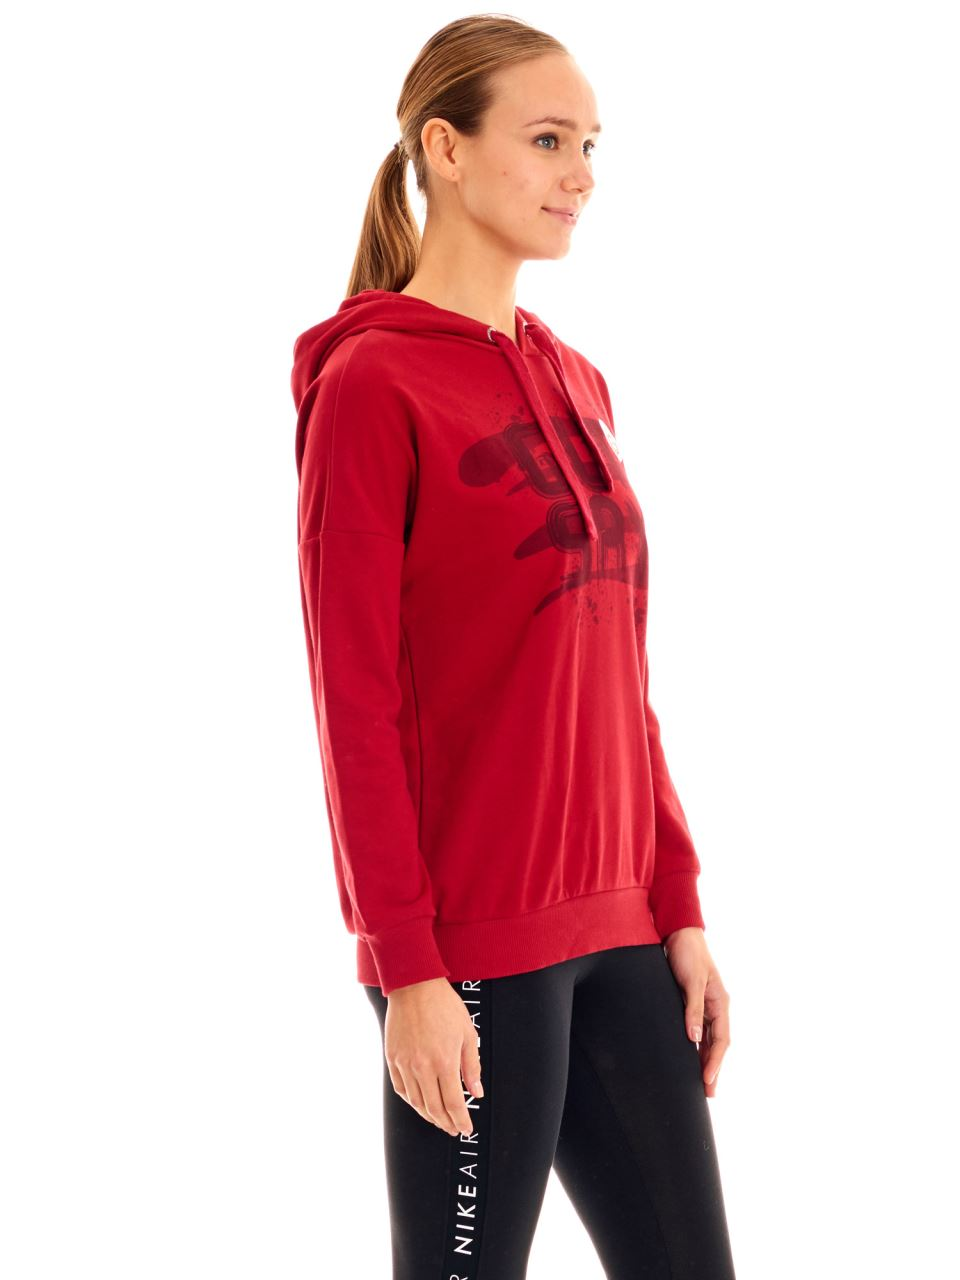 K95161 Sweatshirt